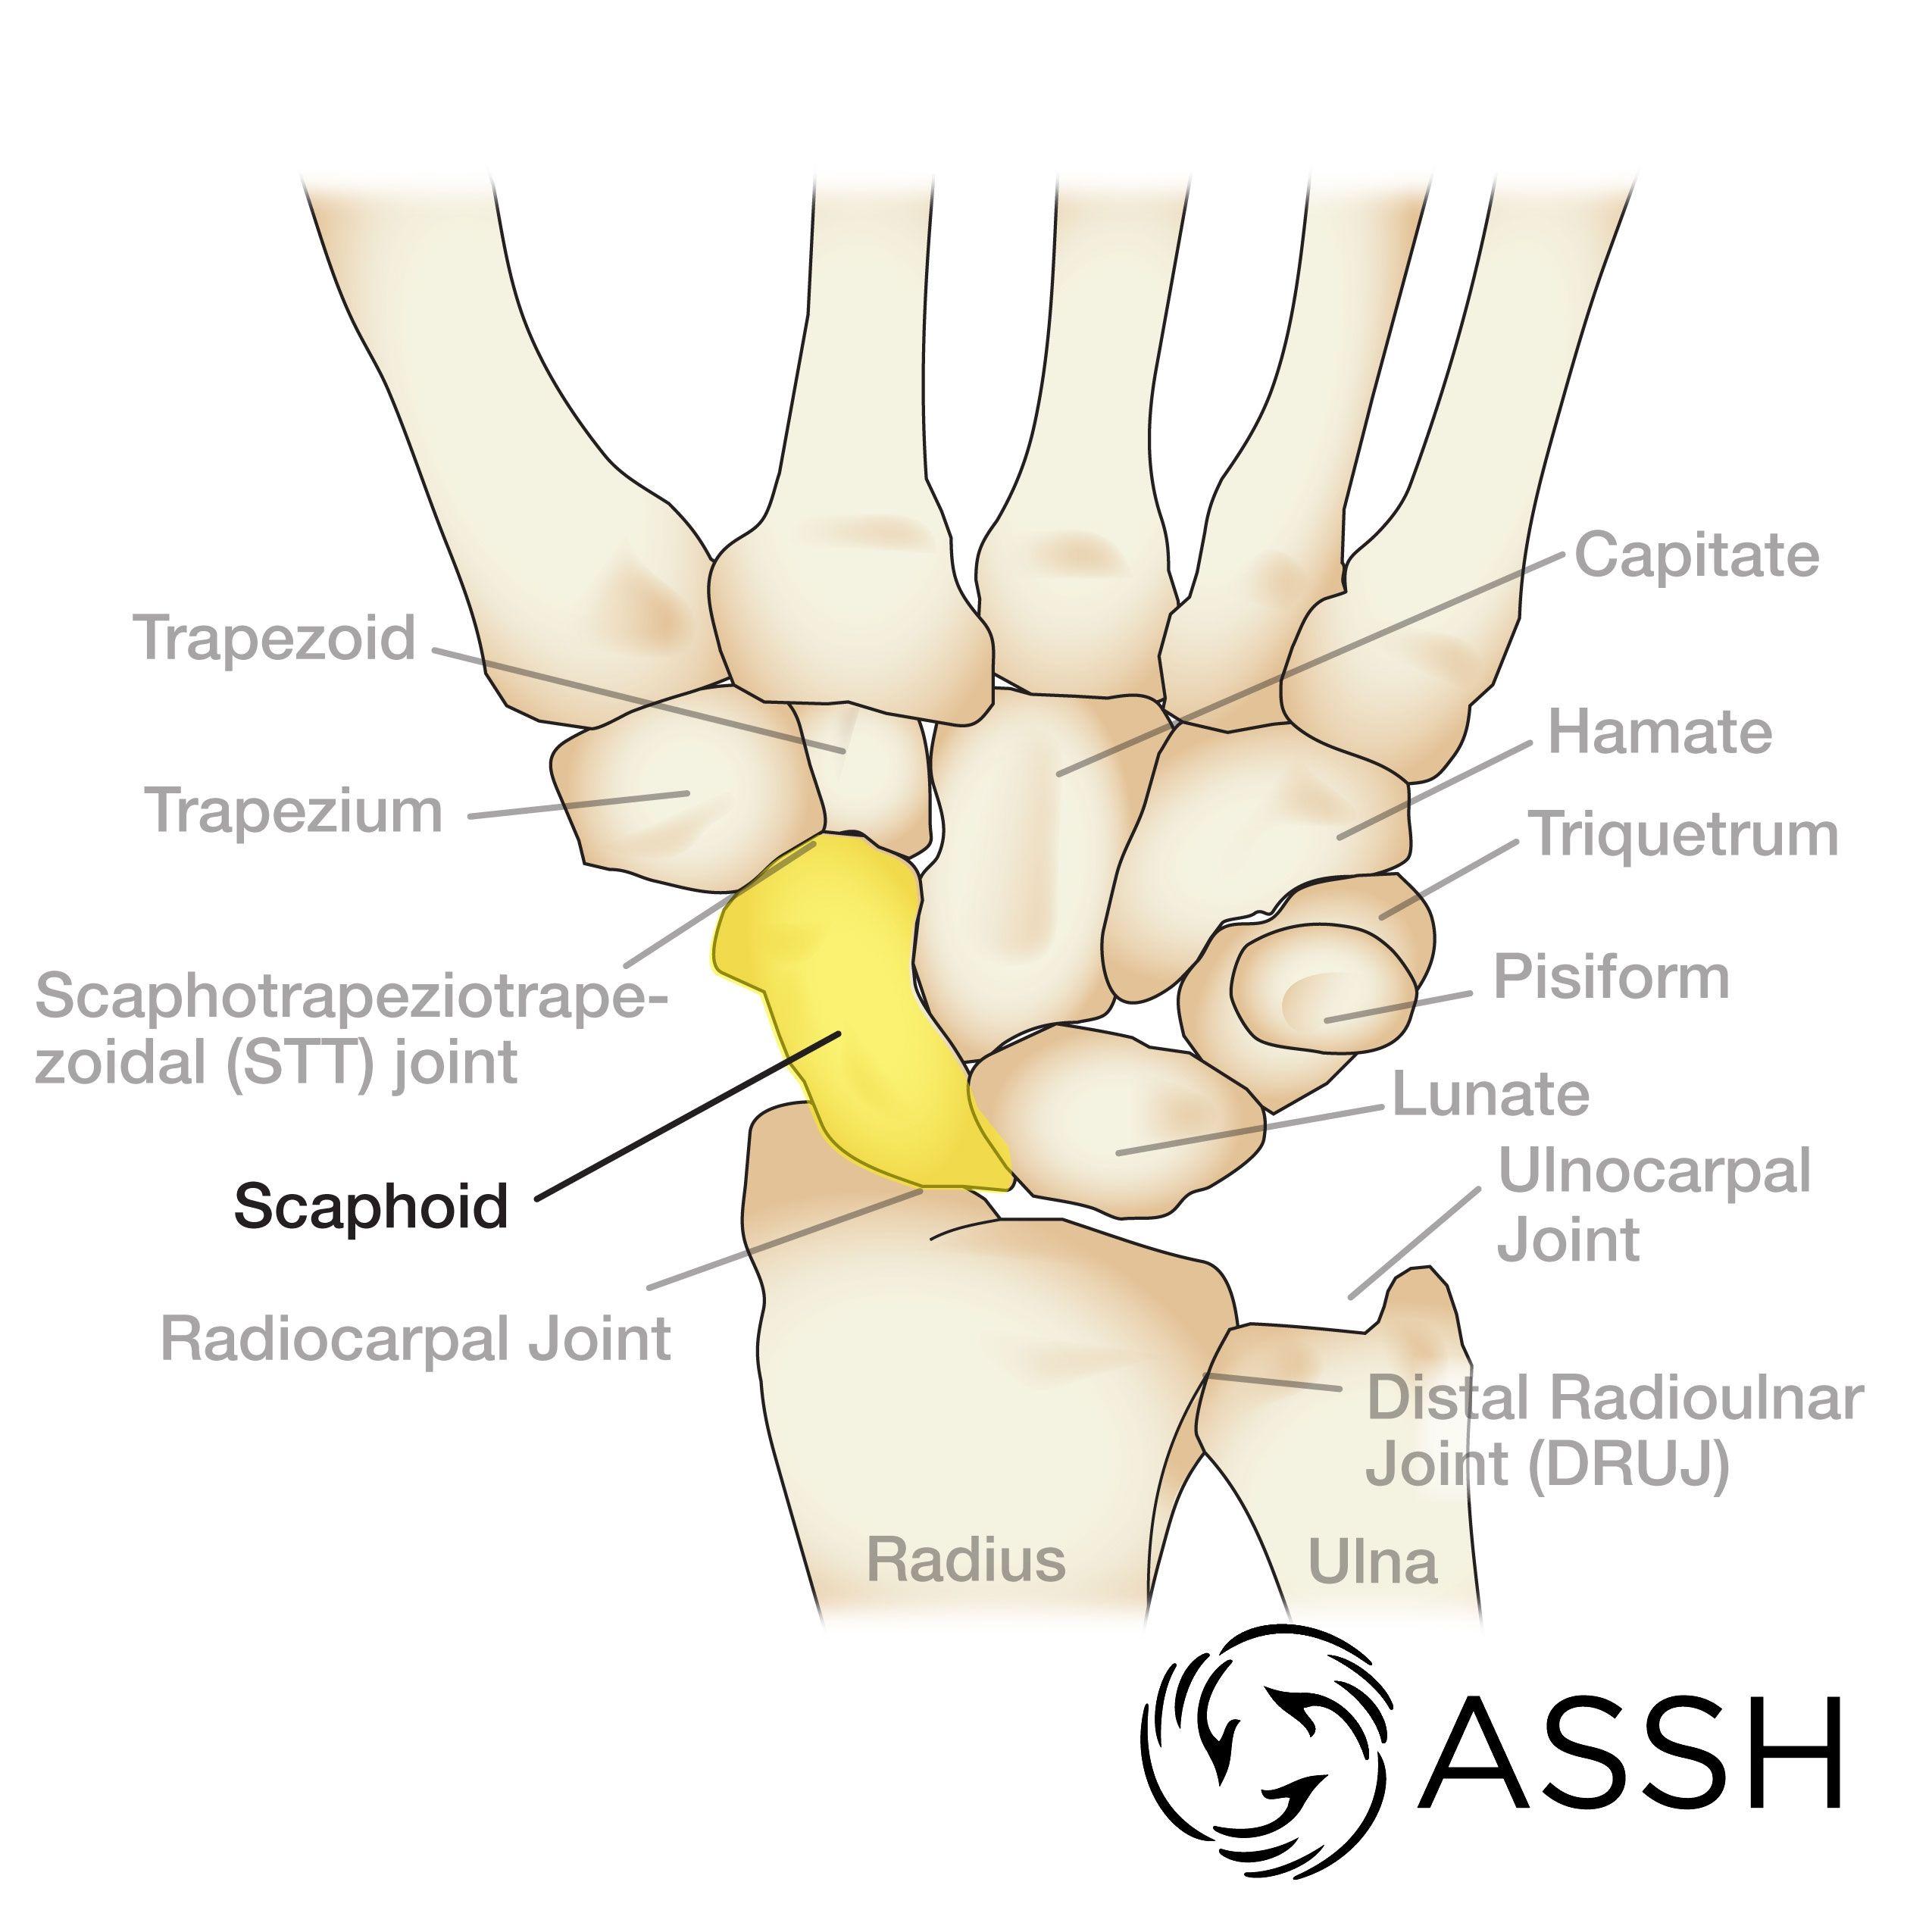 Anatomy Wrist Bones Anatomy 101: Wrist Bones The Handcare Blog ...